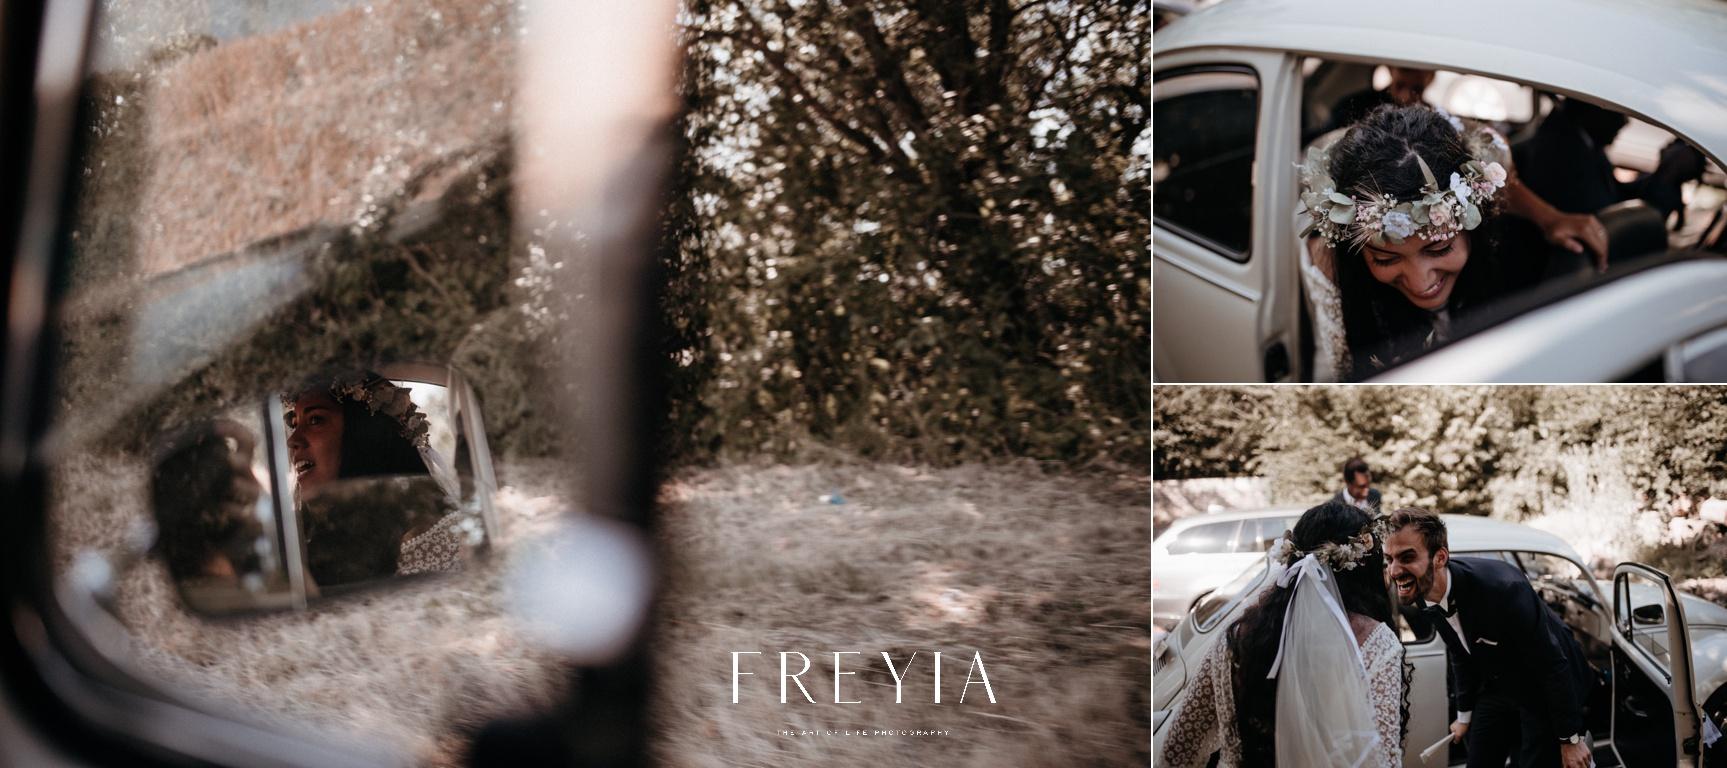 R + T |  mariage reportage alternatif moody intime minimaliste vintage naturel boho boheme |  PHOTOGRAPHE mariage PARIS france destination  | FREYIA photography_-196.jpg